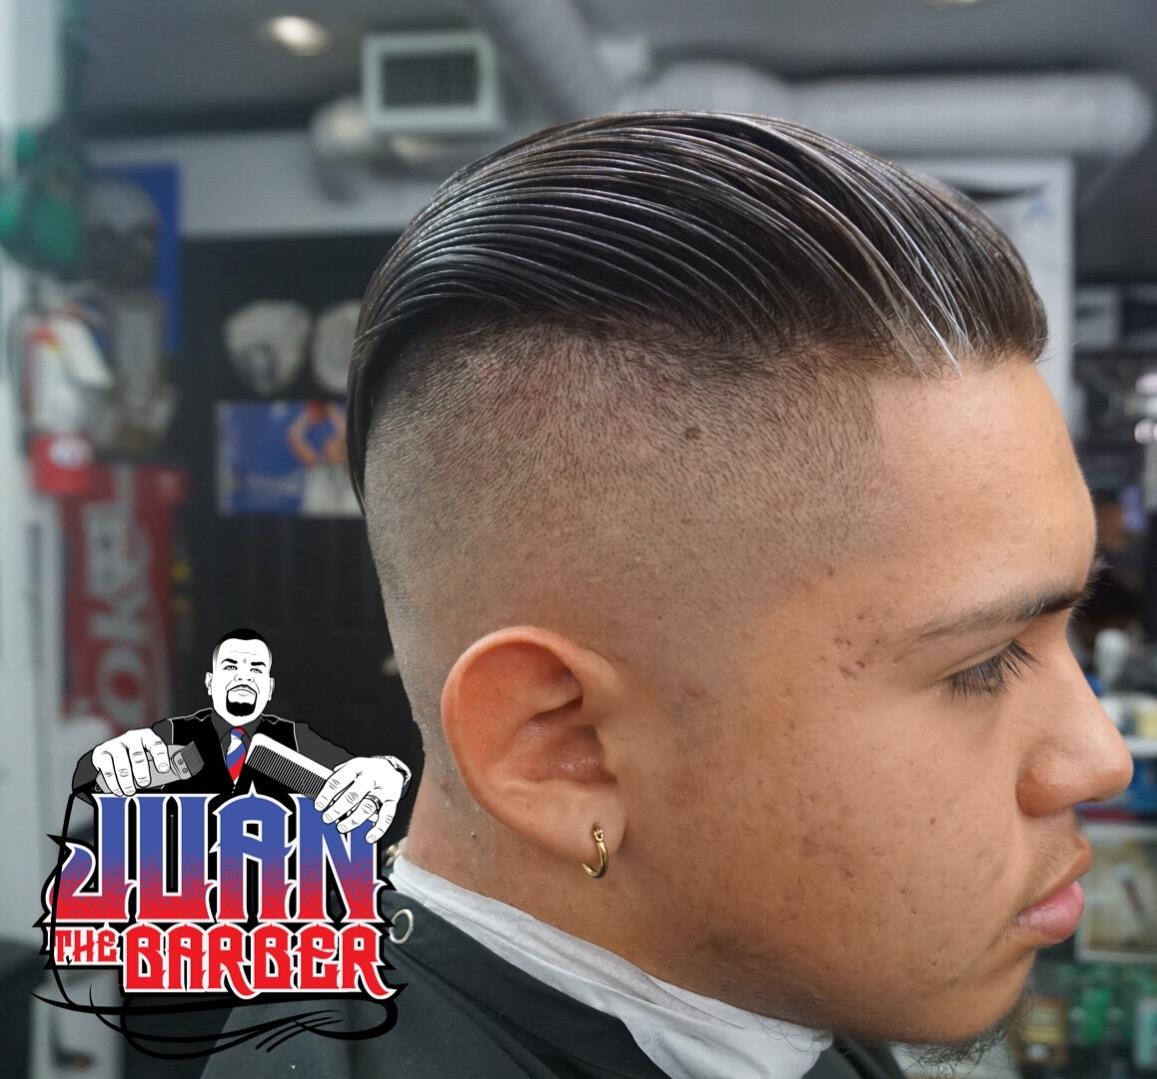 lone Star Barber Shop image 2